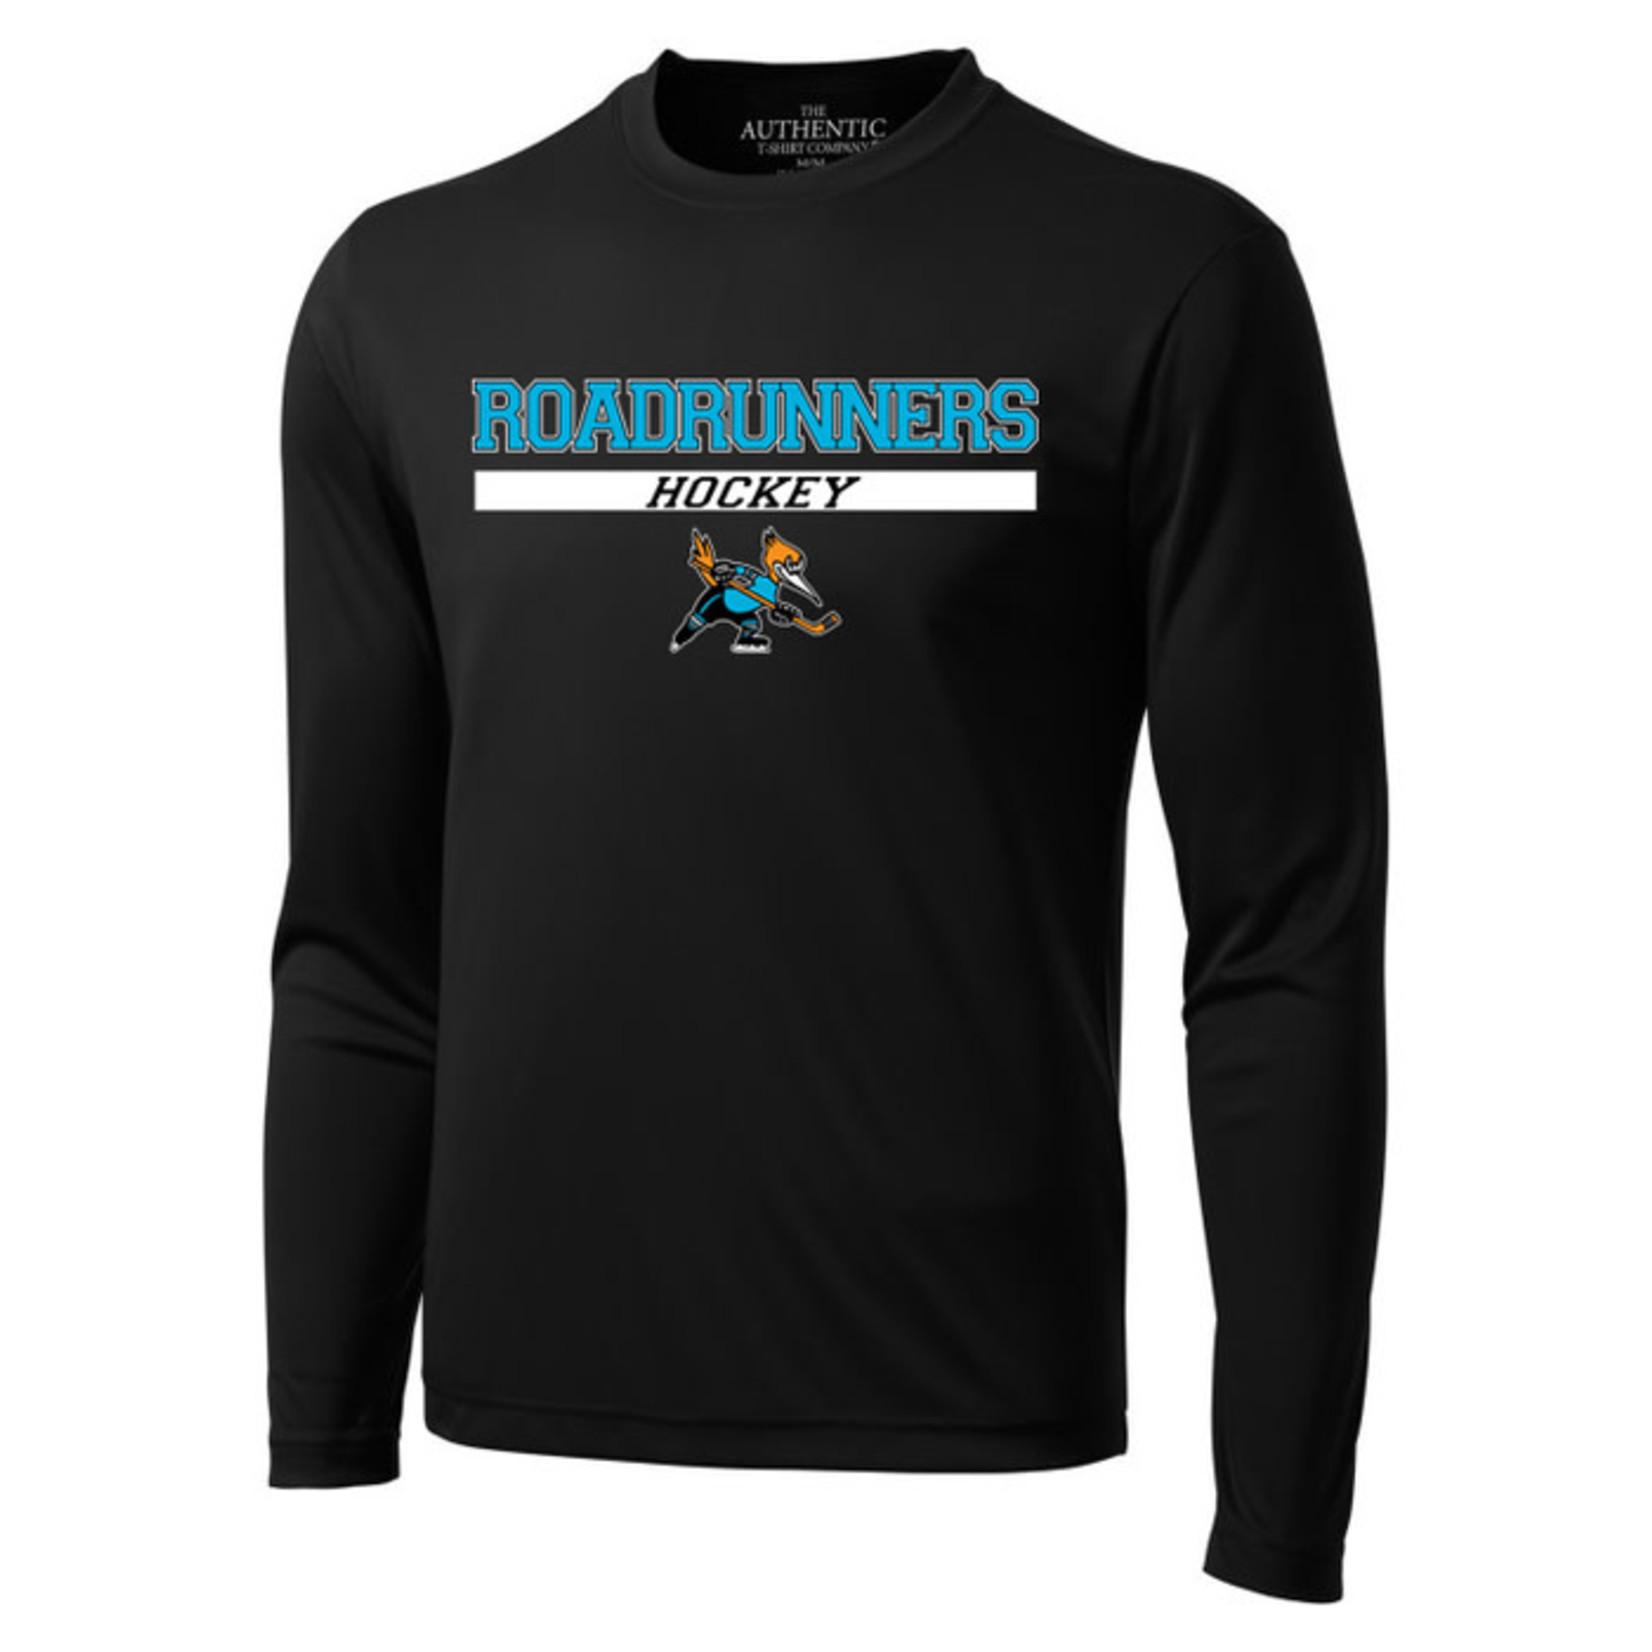 Roadrunner Tech Tee Long Sleeve Youth